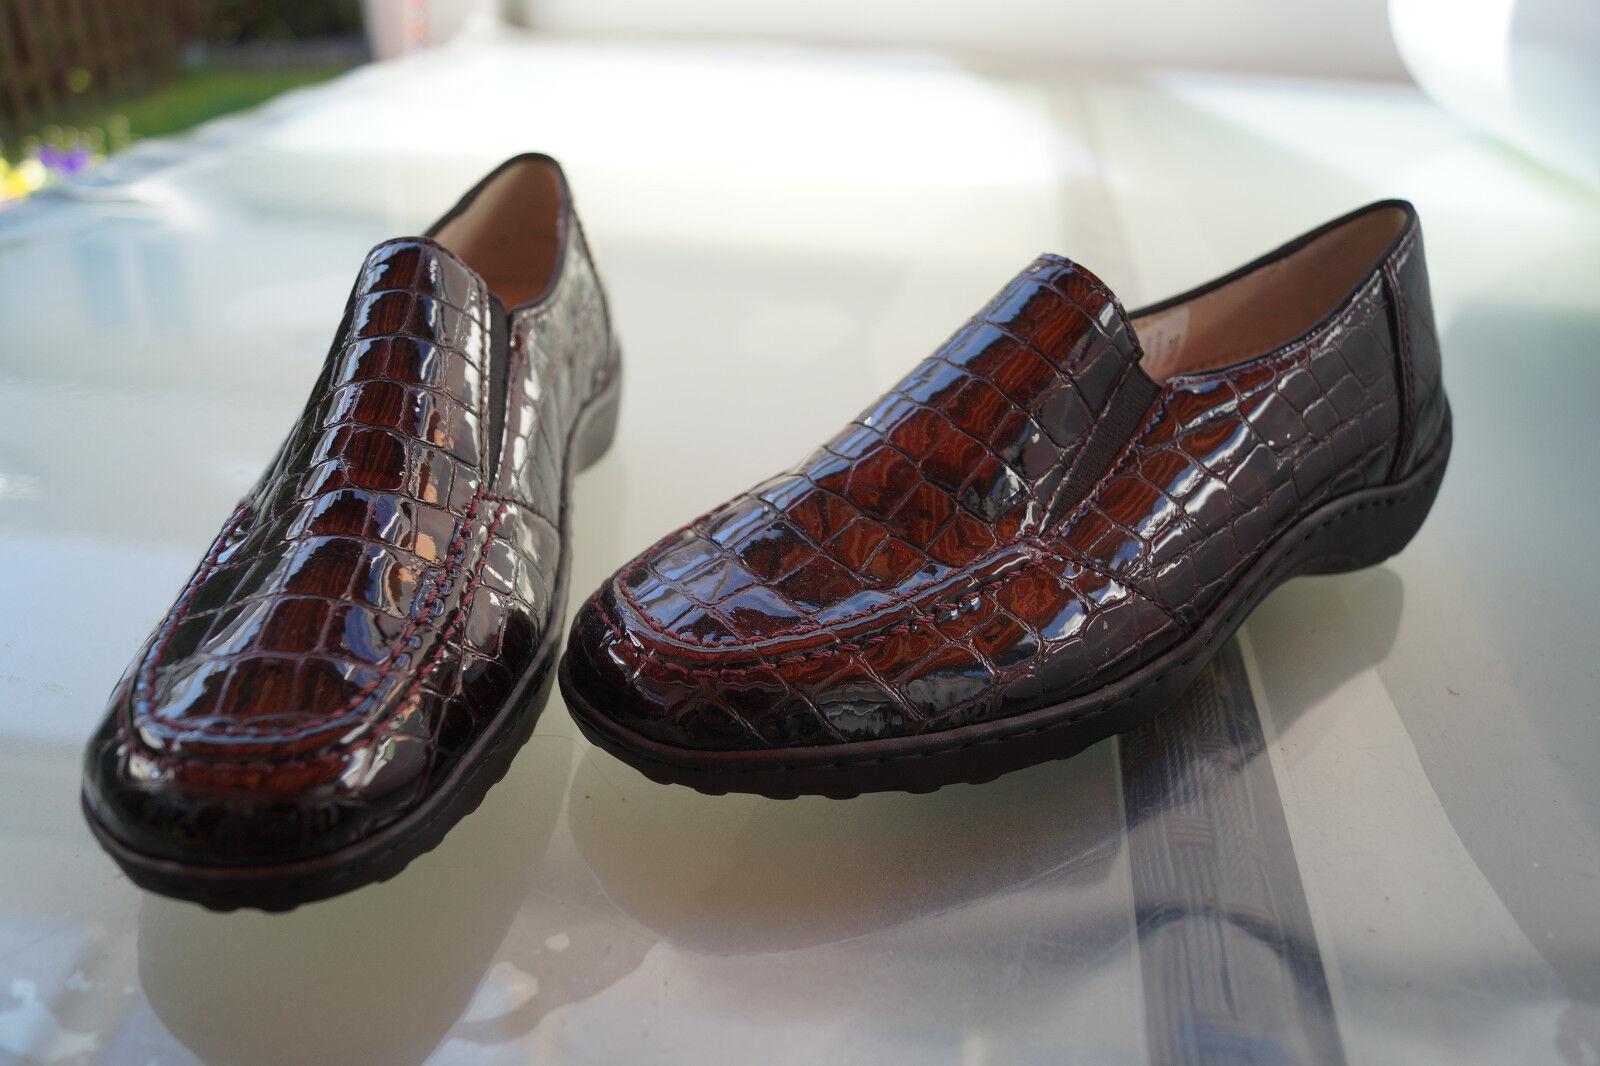 ARA Damen Comfort Schuhe Slipper Mokassins Lack Leder Einlagen Gr.8,5 G 42,5 NEU